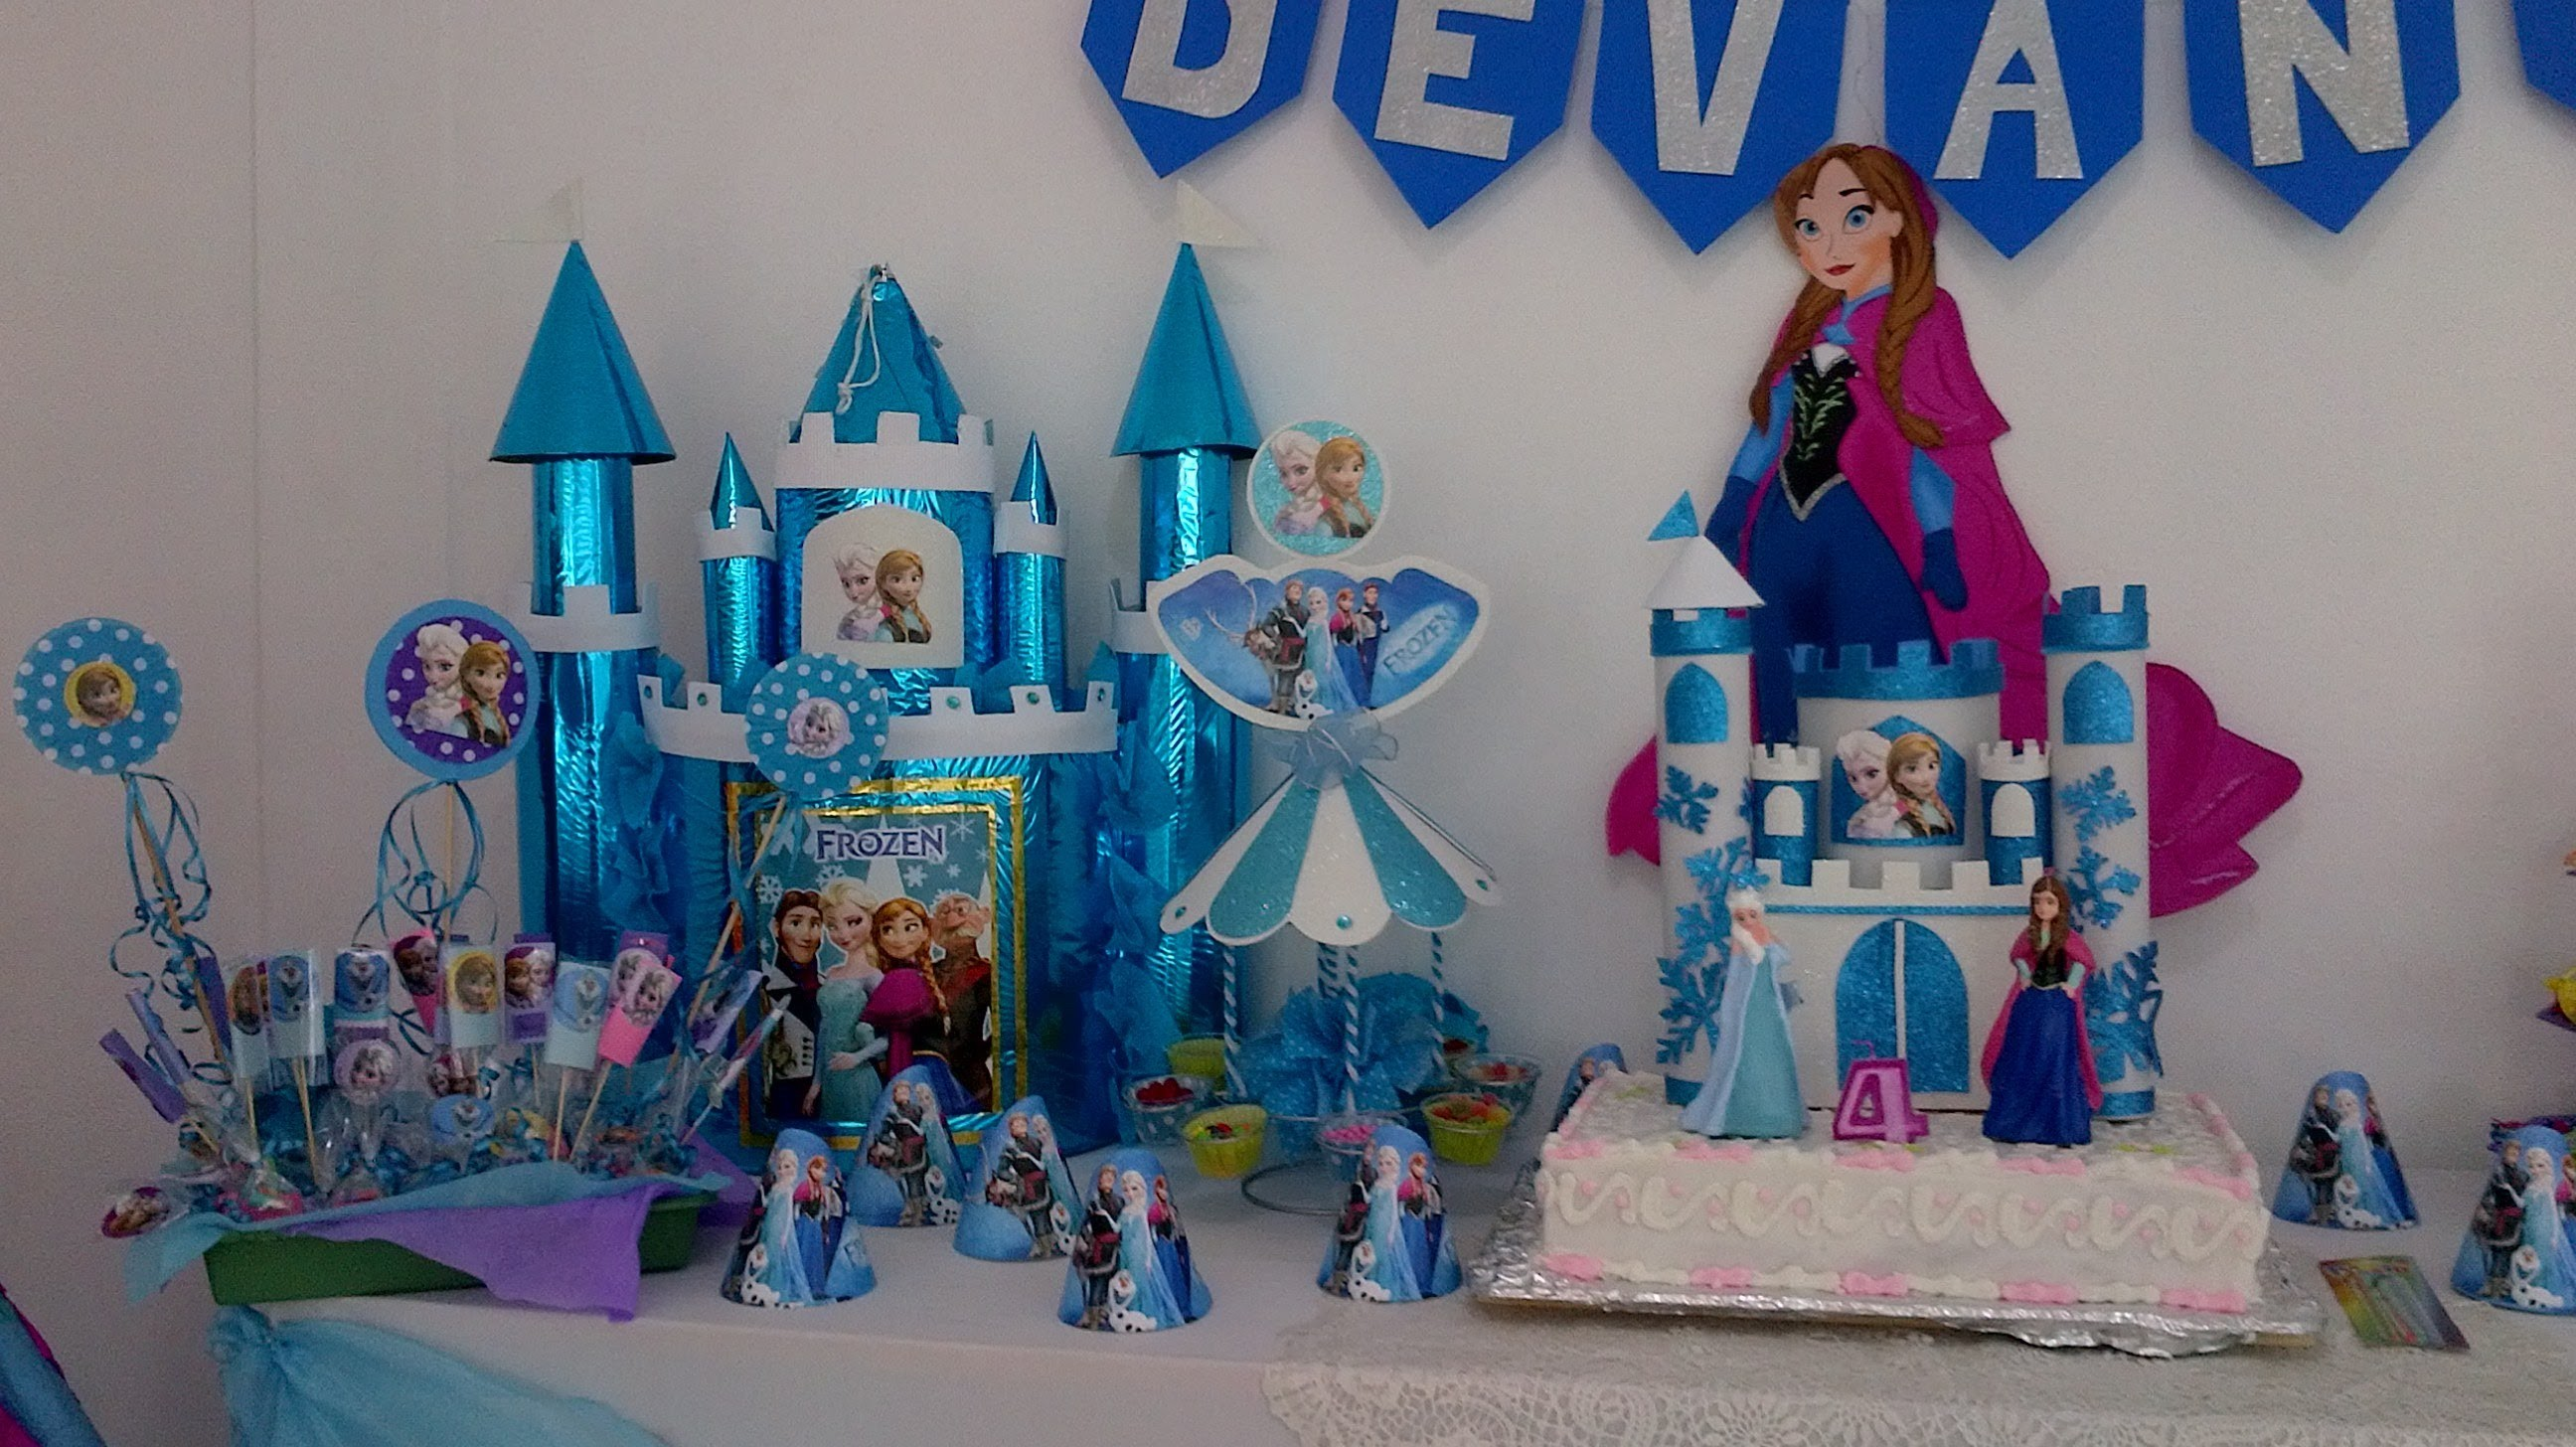 Fiesta de frozen elsa y anna. frozen party! Parte 2